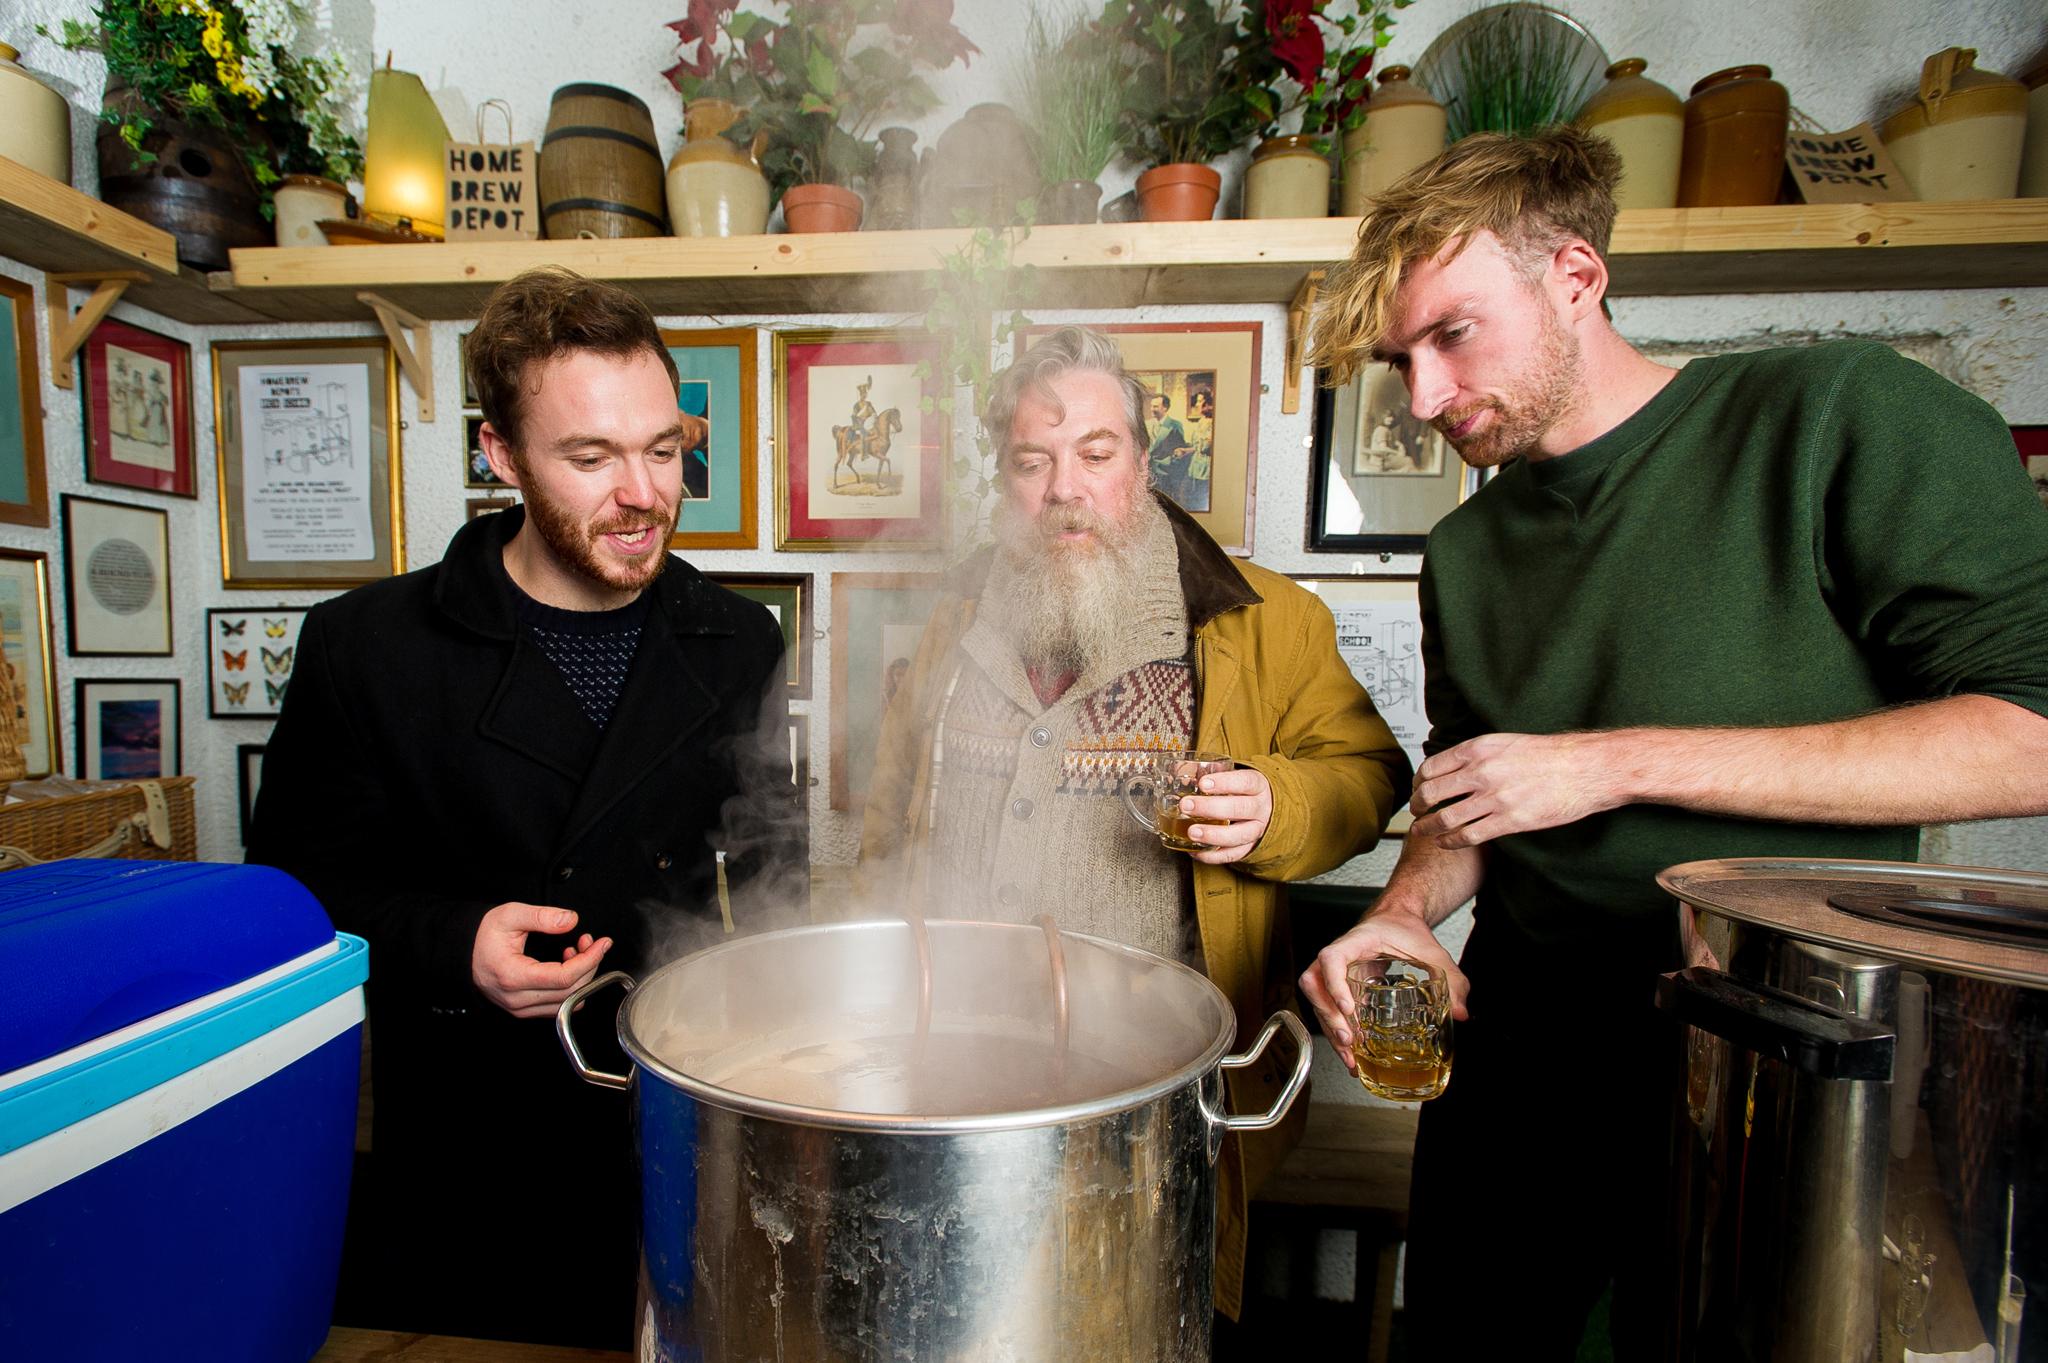 Alex Plim tries a home brewing workshop